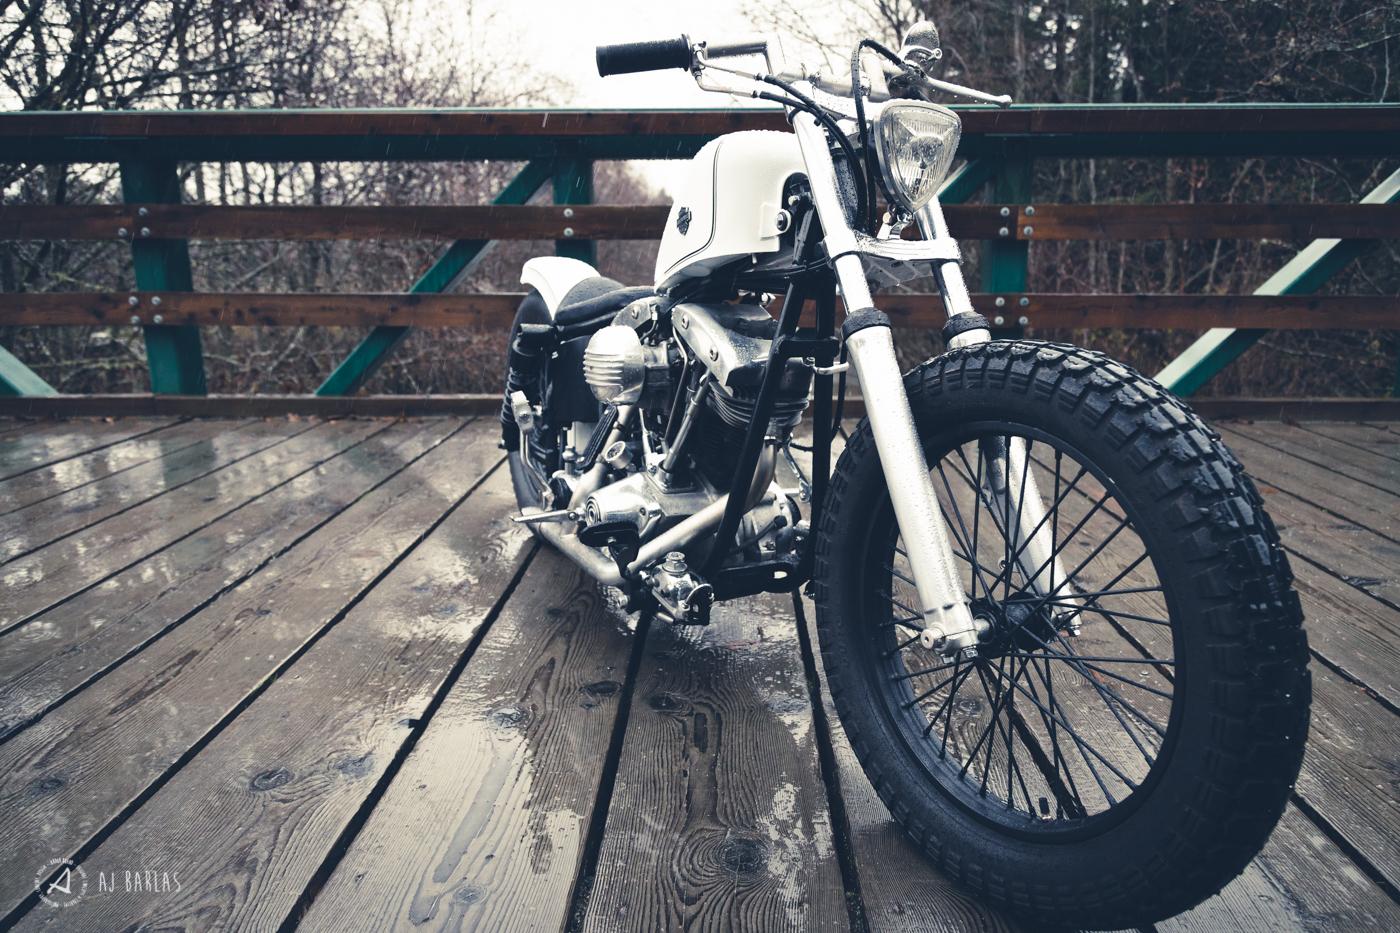 Todd Schumlick's custom 1975 Harley Davidson Period Incorrect Shovelhead